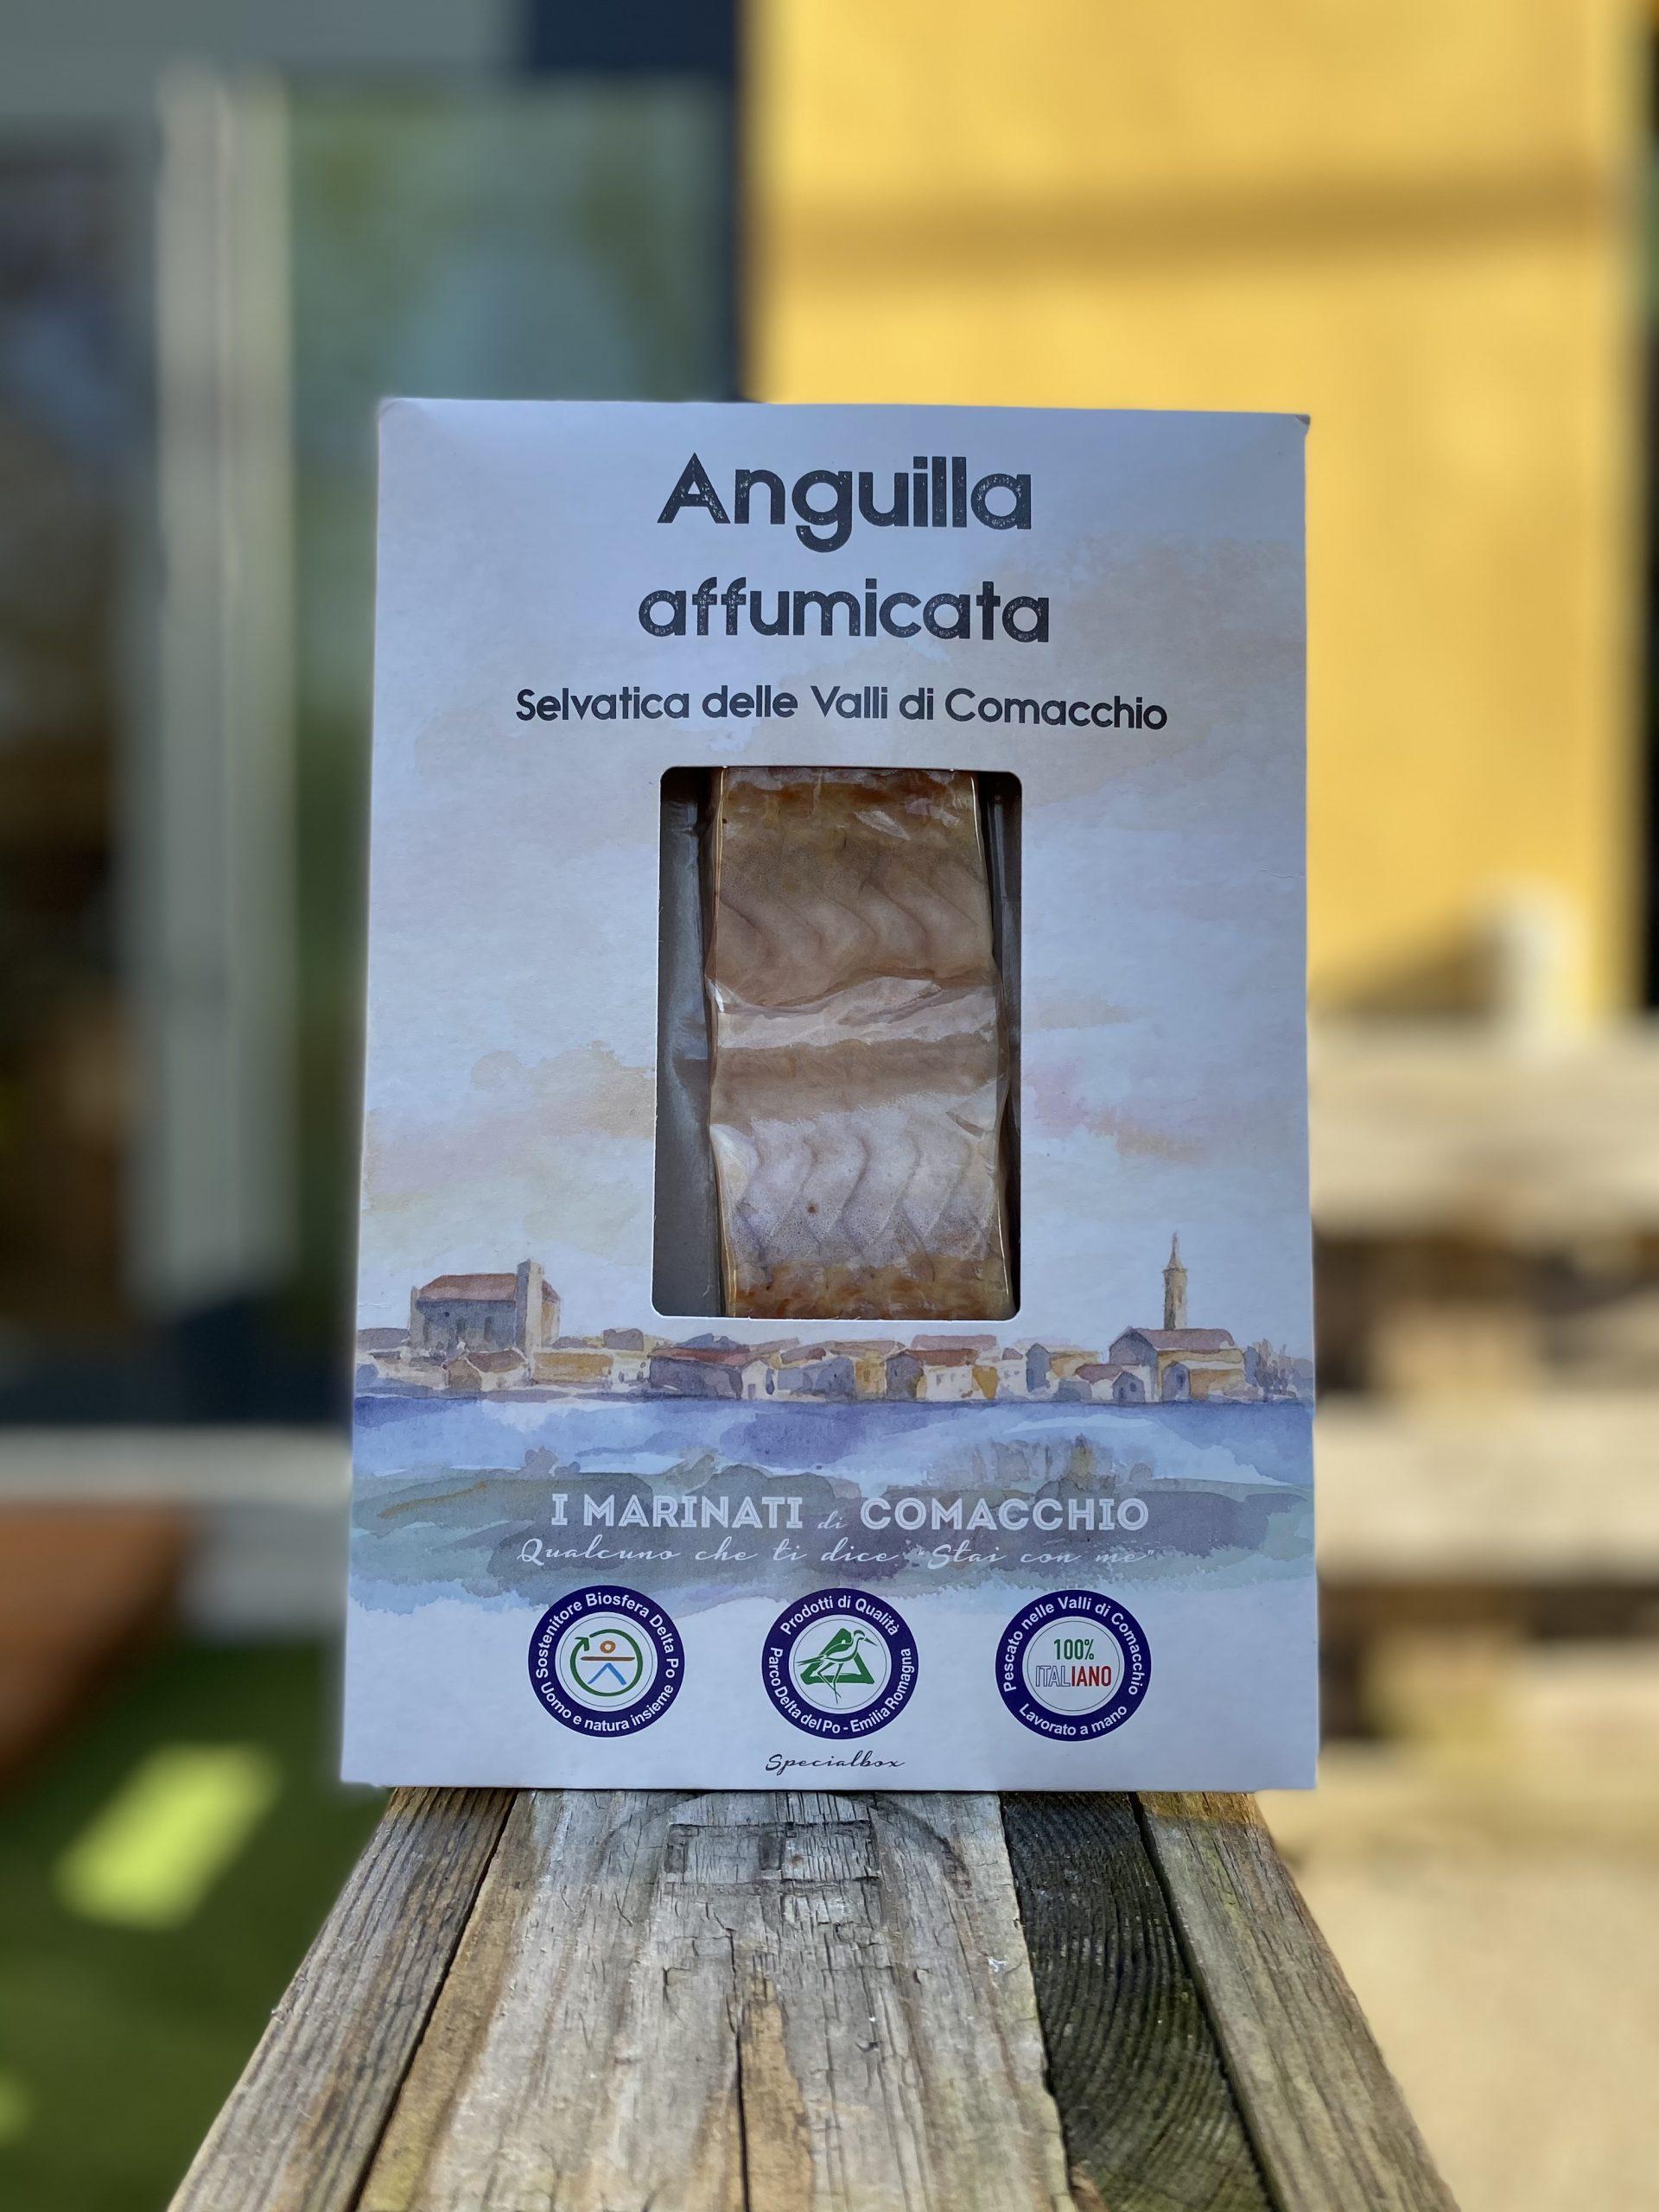 Anguilla affumicata